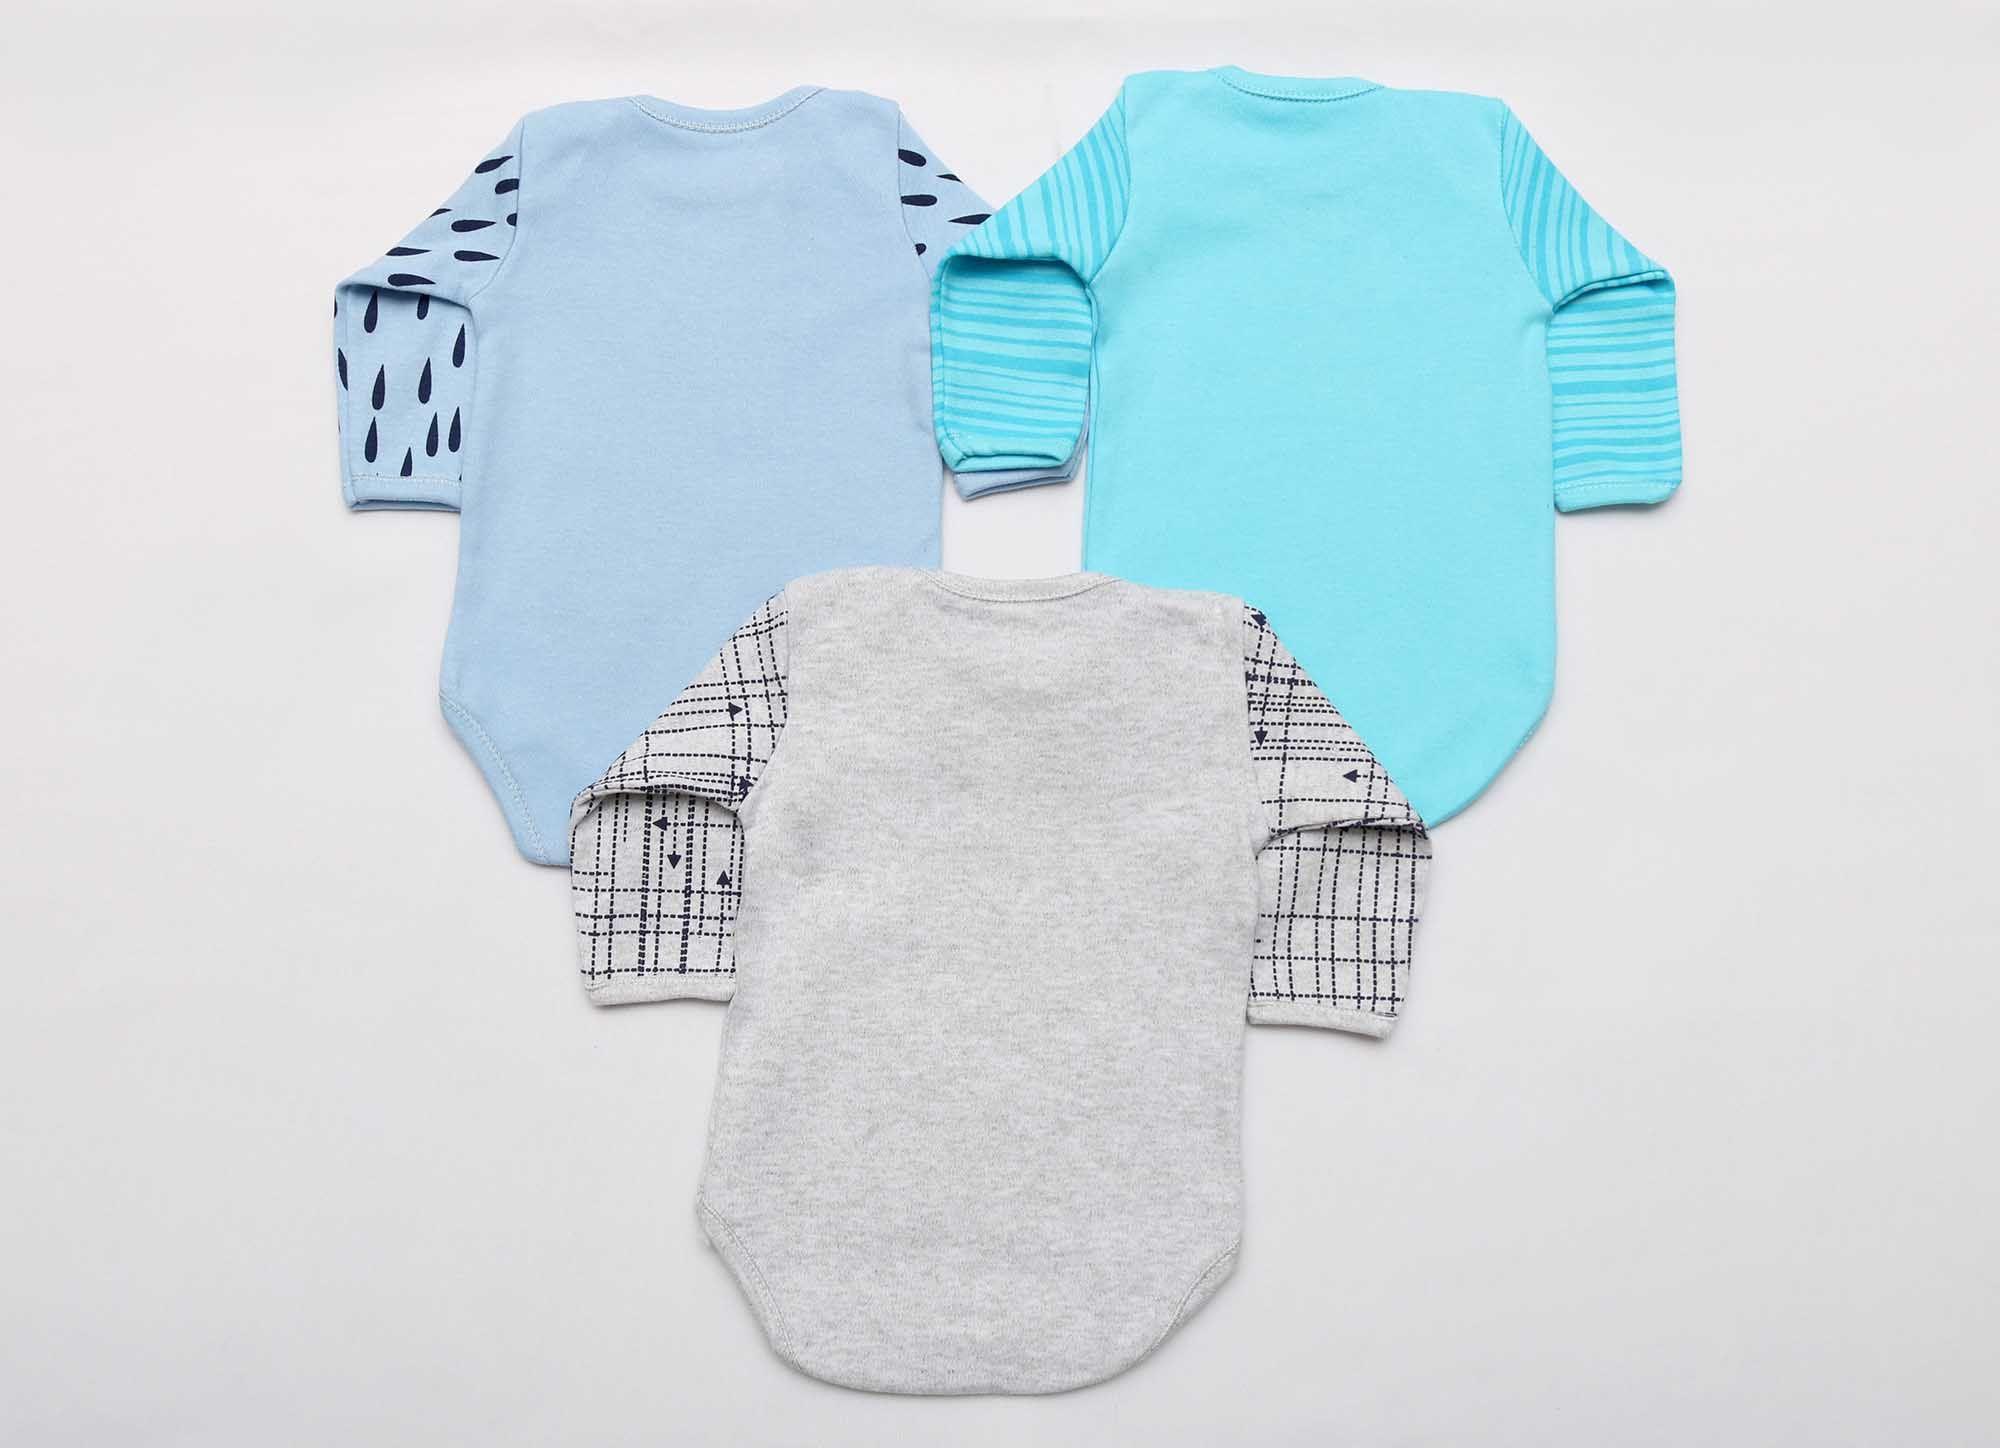 Kit Body Bebê 3 Peças Menino Mescla, Azul e Azul Água Projeto